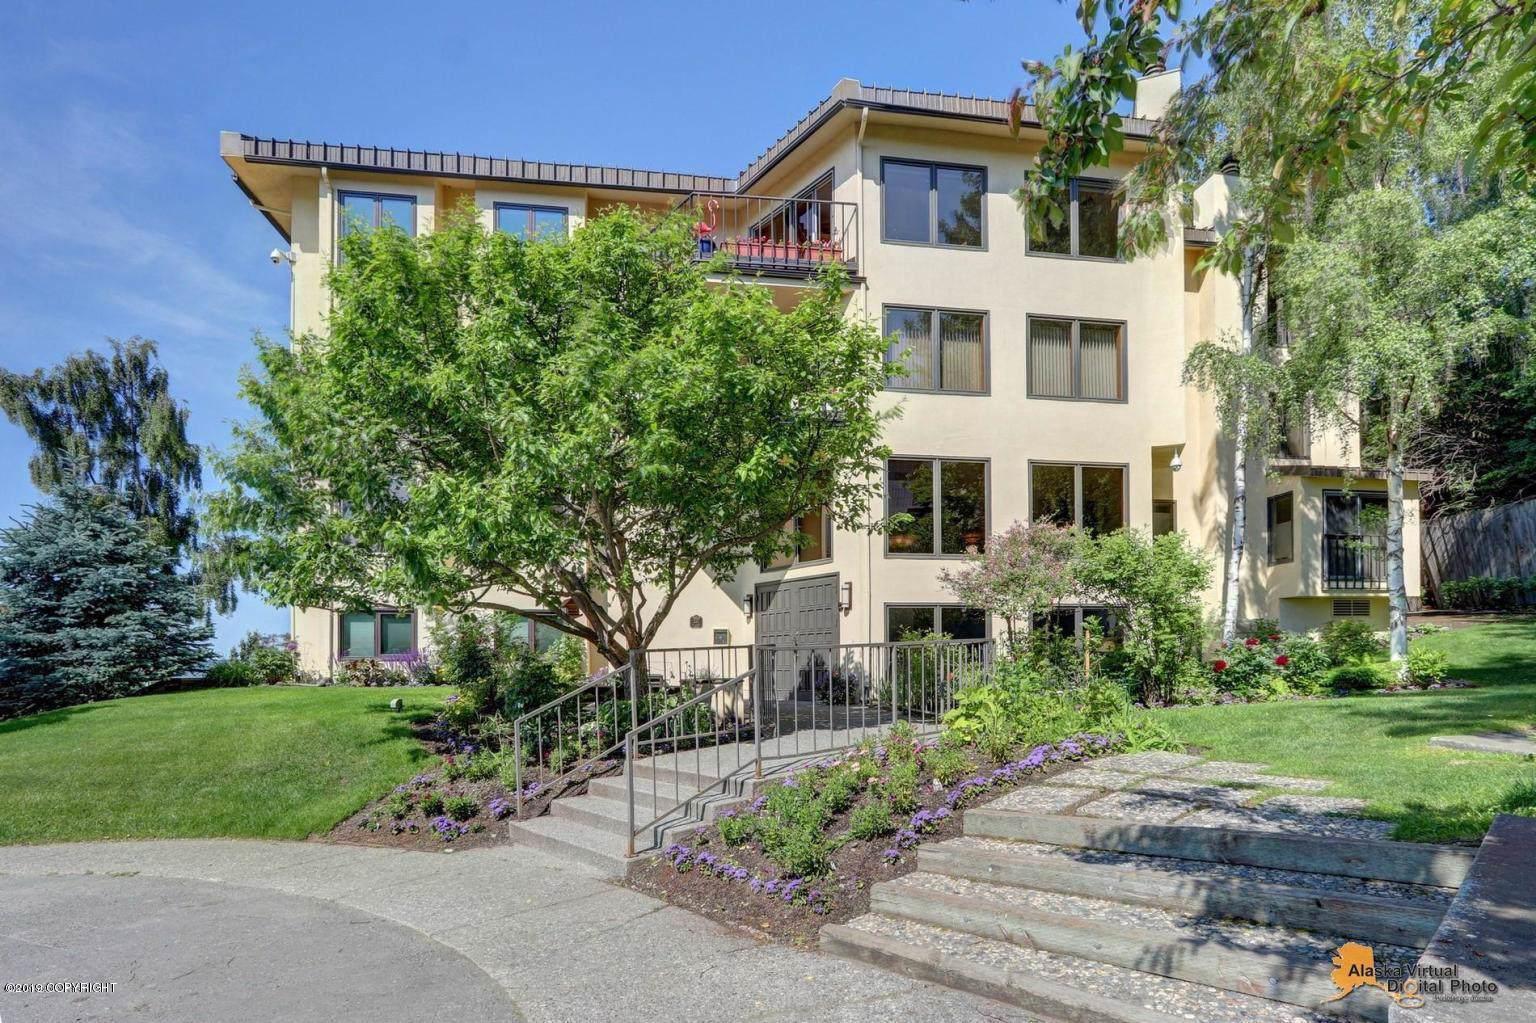 333 M Street #210, Anchorage, AK 99501 (MLS #19-16729) :: RMG Real Estate Network   Keller Williams Realty Alaska Group